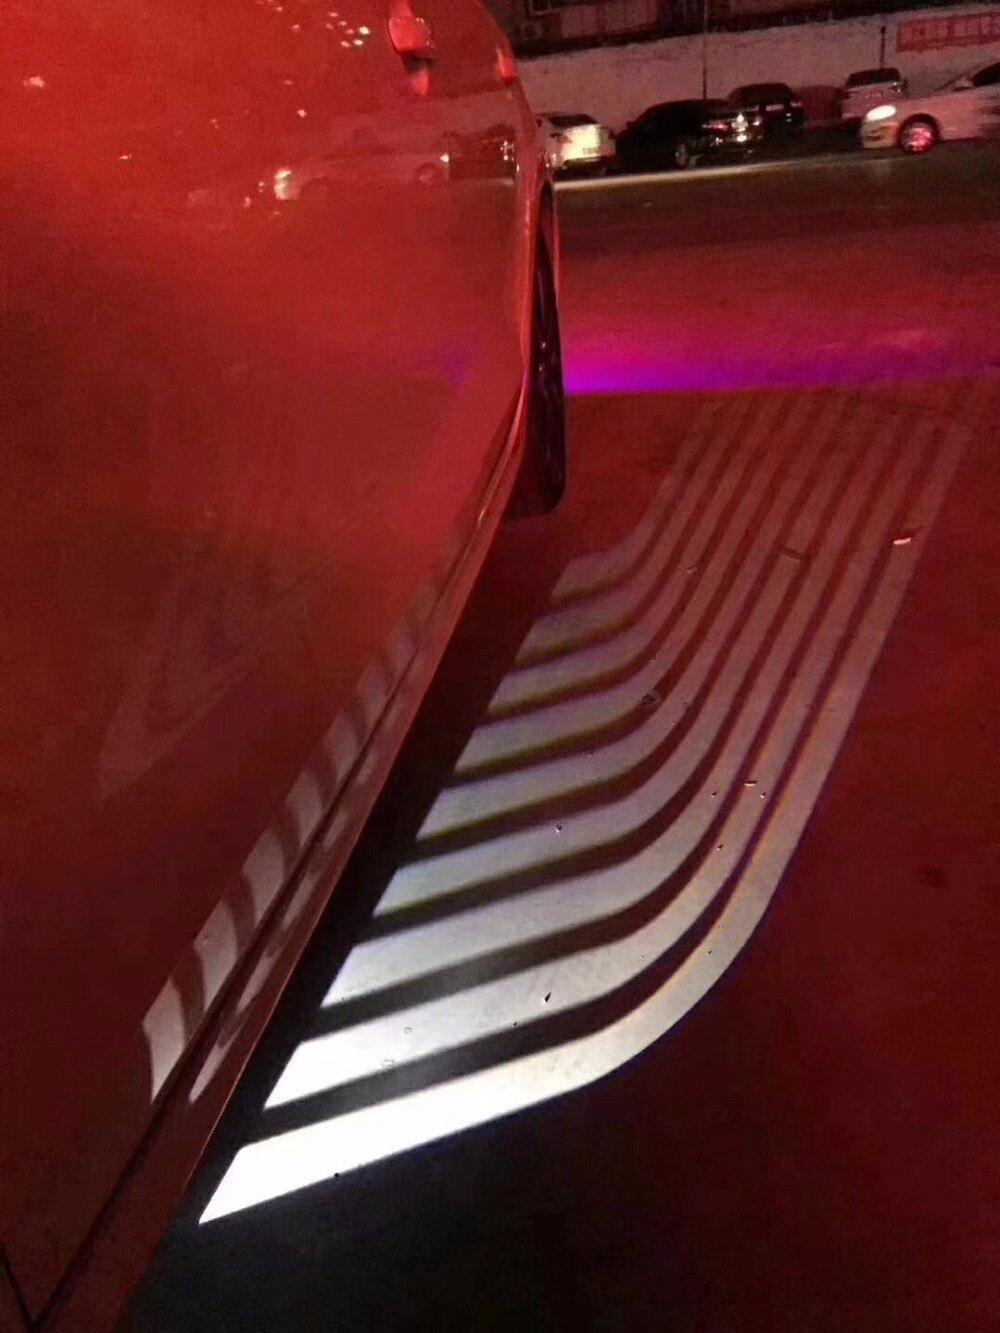 Qirun led Greeting Atmosphere Decorative Daylights Brake Fog lamp Reverse Headlight Turn signal for Ford F150 F250 F350 F53 F59 qirun led greeting atmosphere decorative daylights brake fog lamp reverse headlight turn signal for ford explorer sport